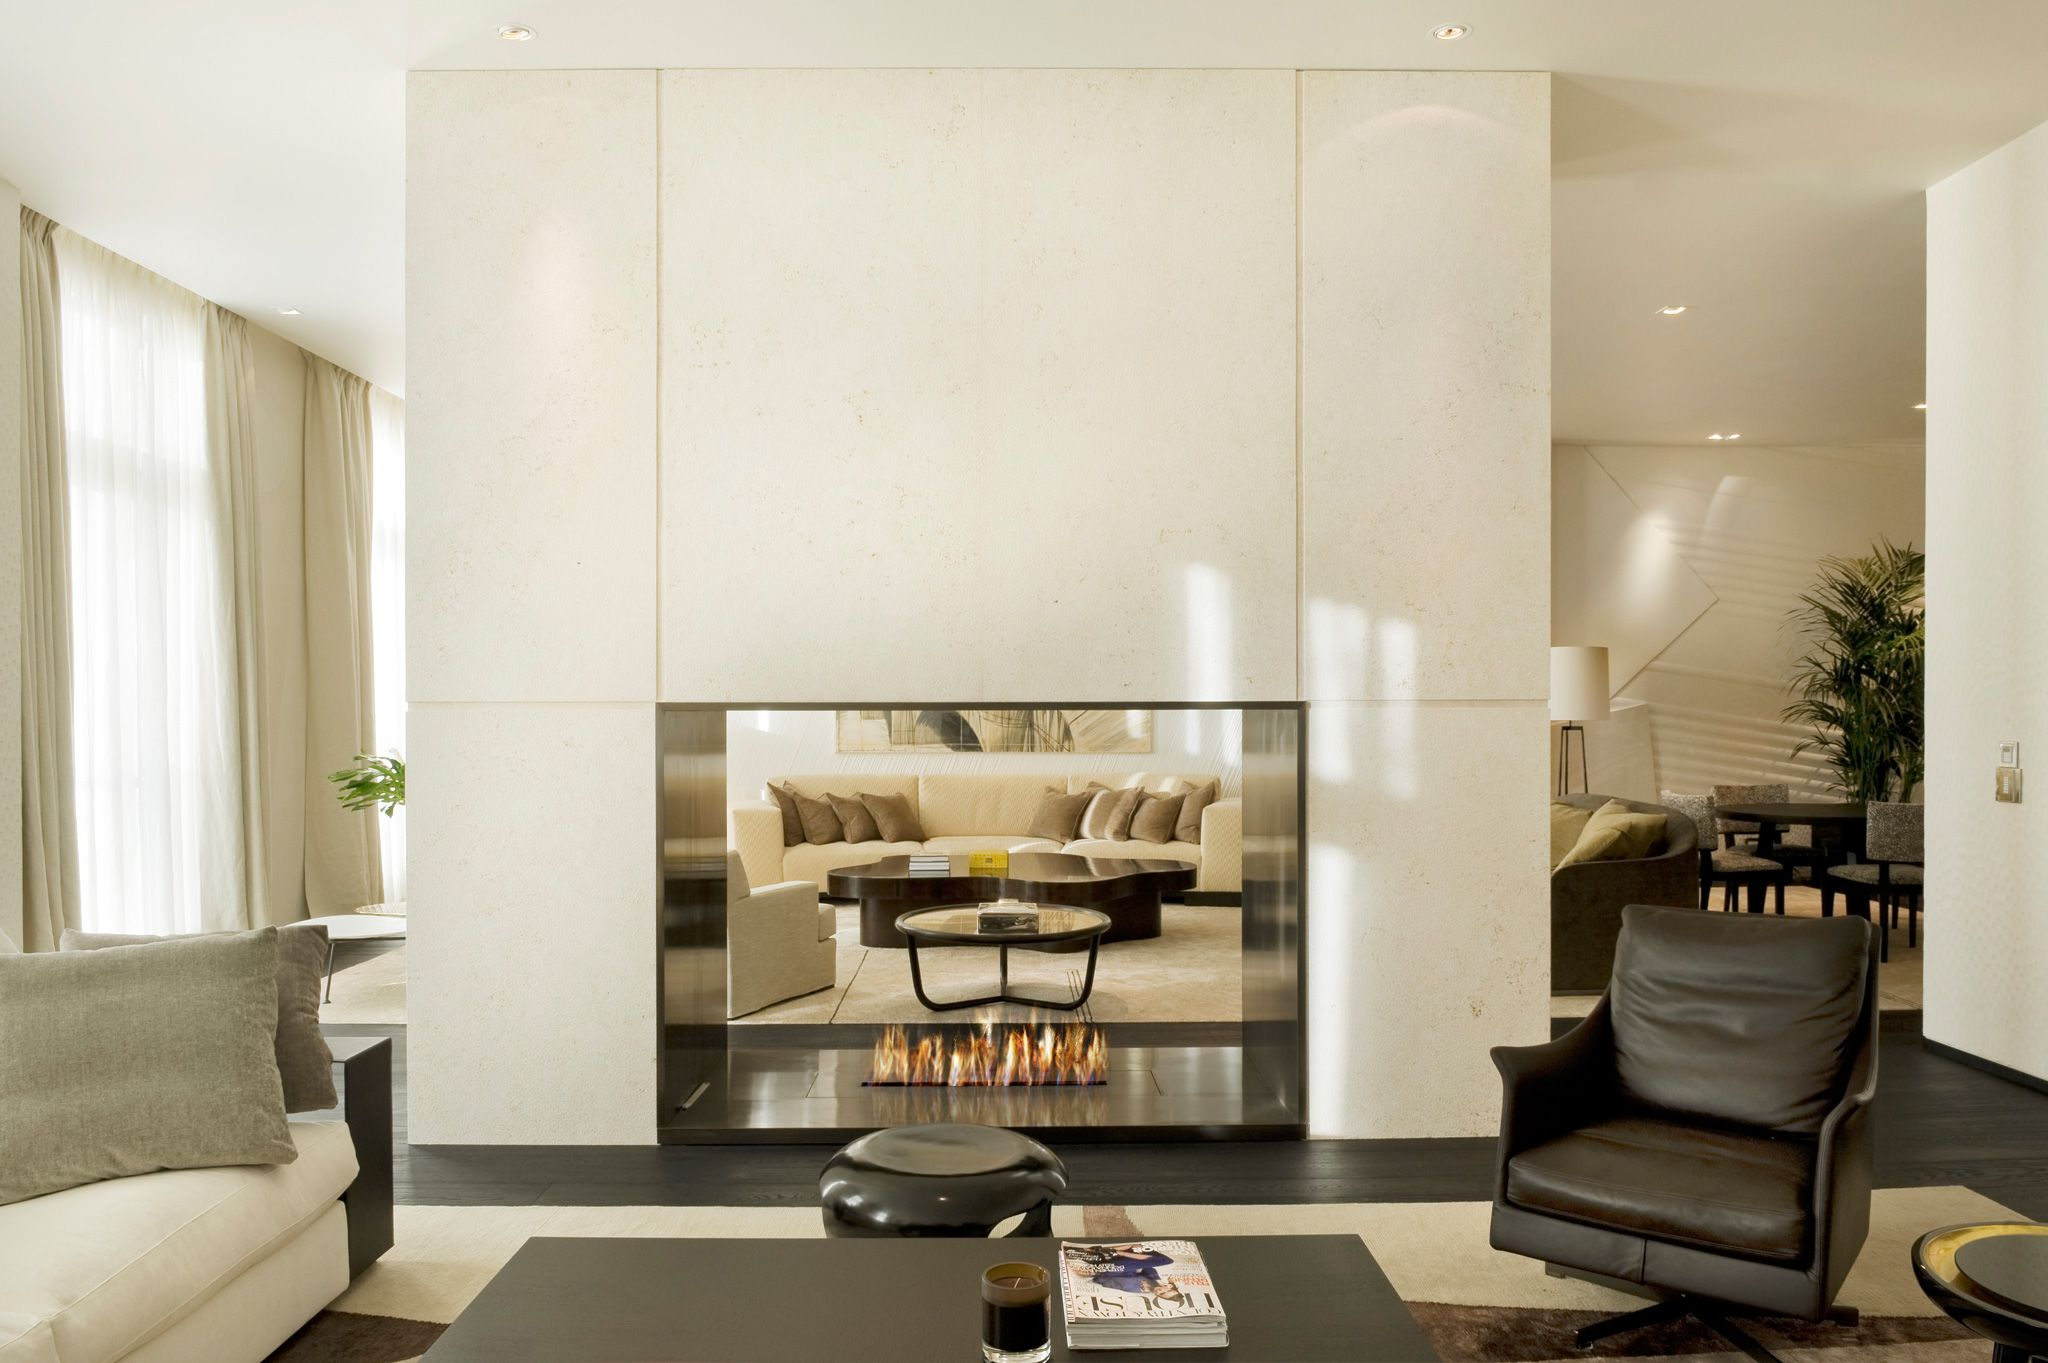 Alberto-Pintos-Modern-Interiors